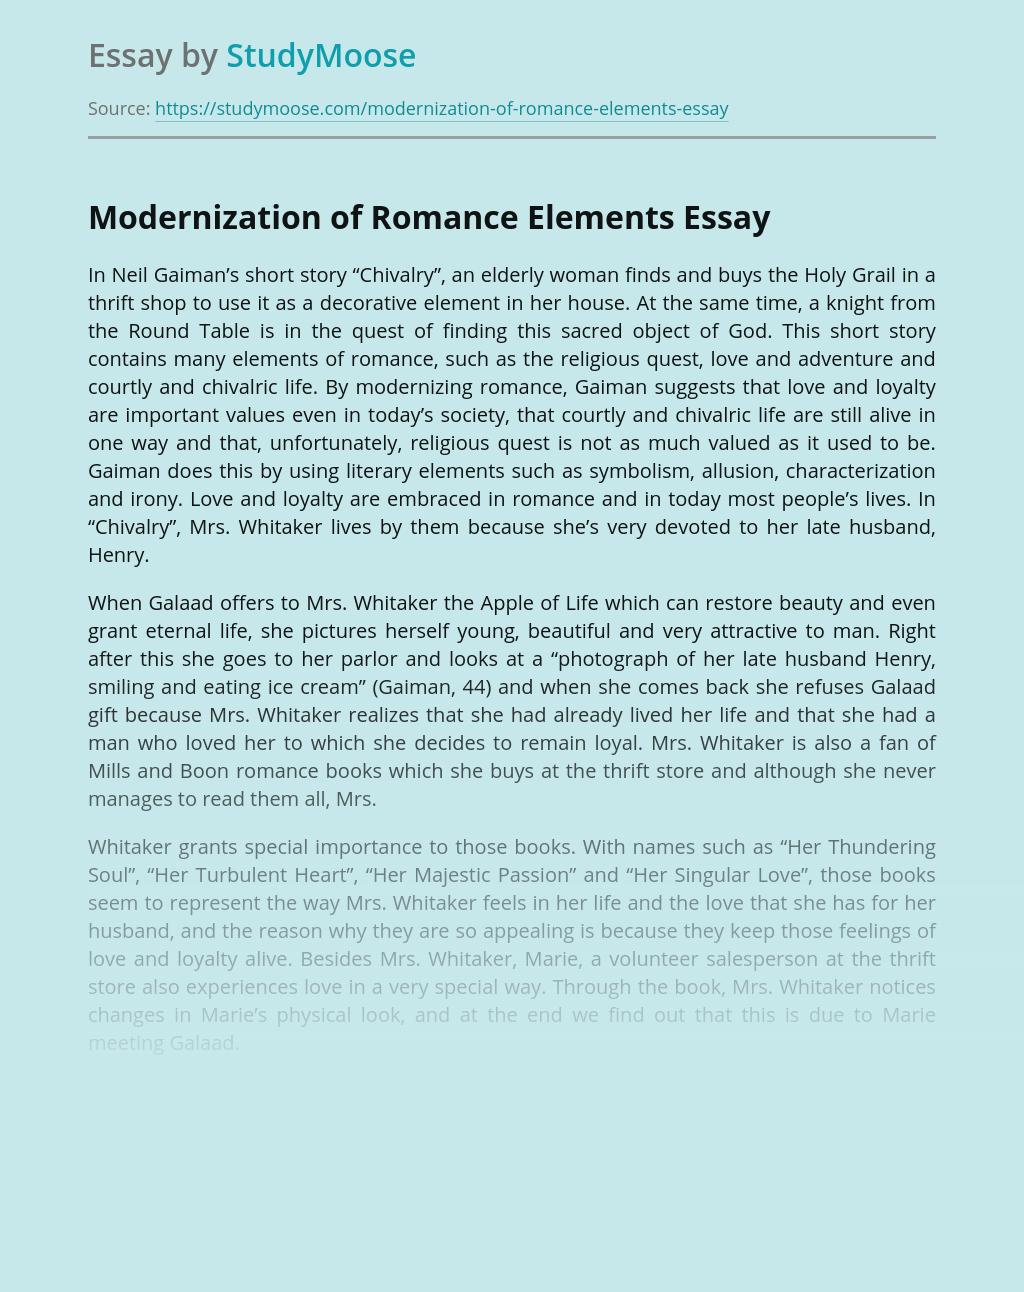 Modernization of Romance Elements